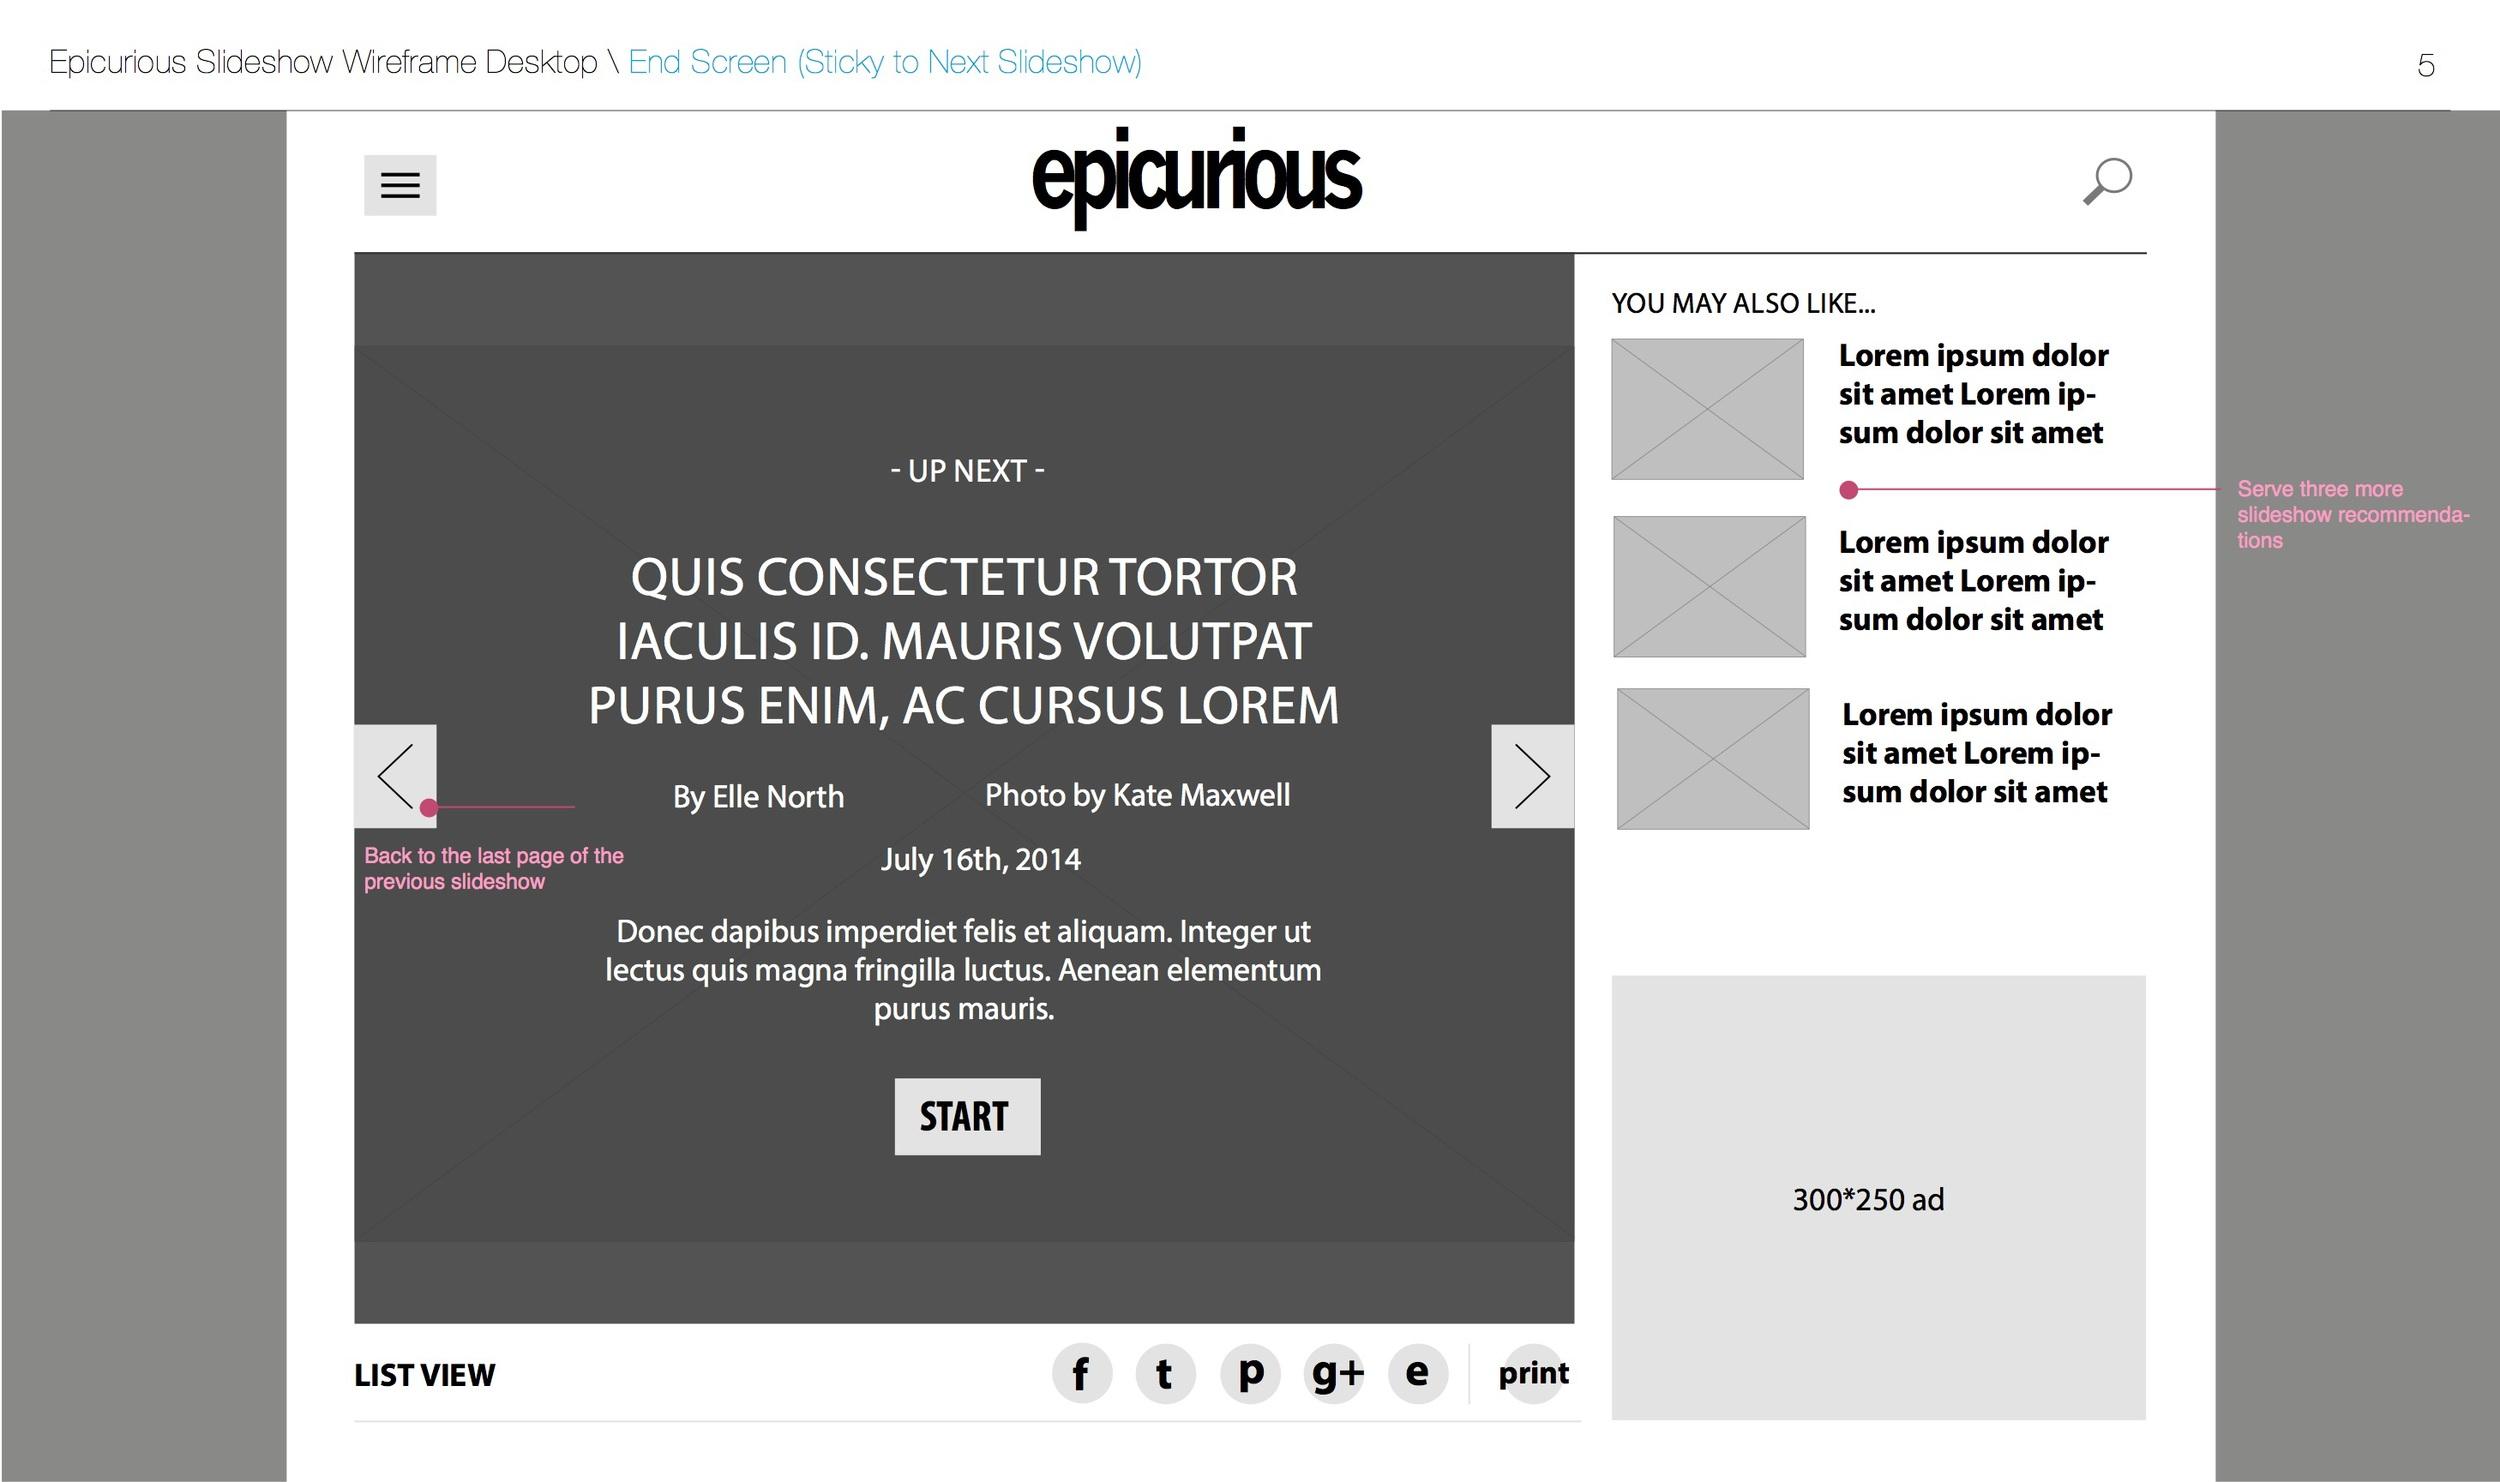 Epi_Slideshow_Wires_V4_3.jpg